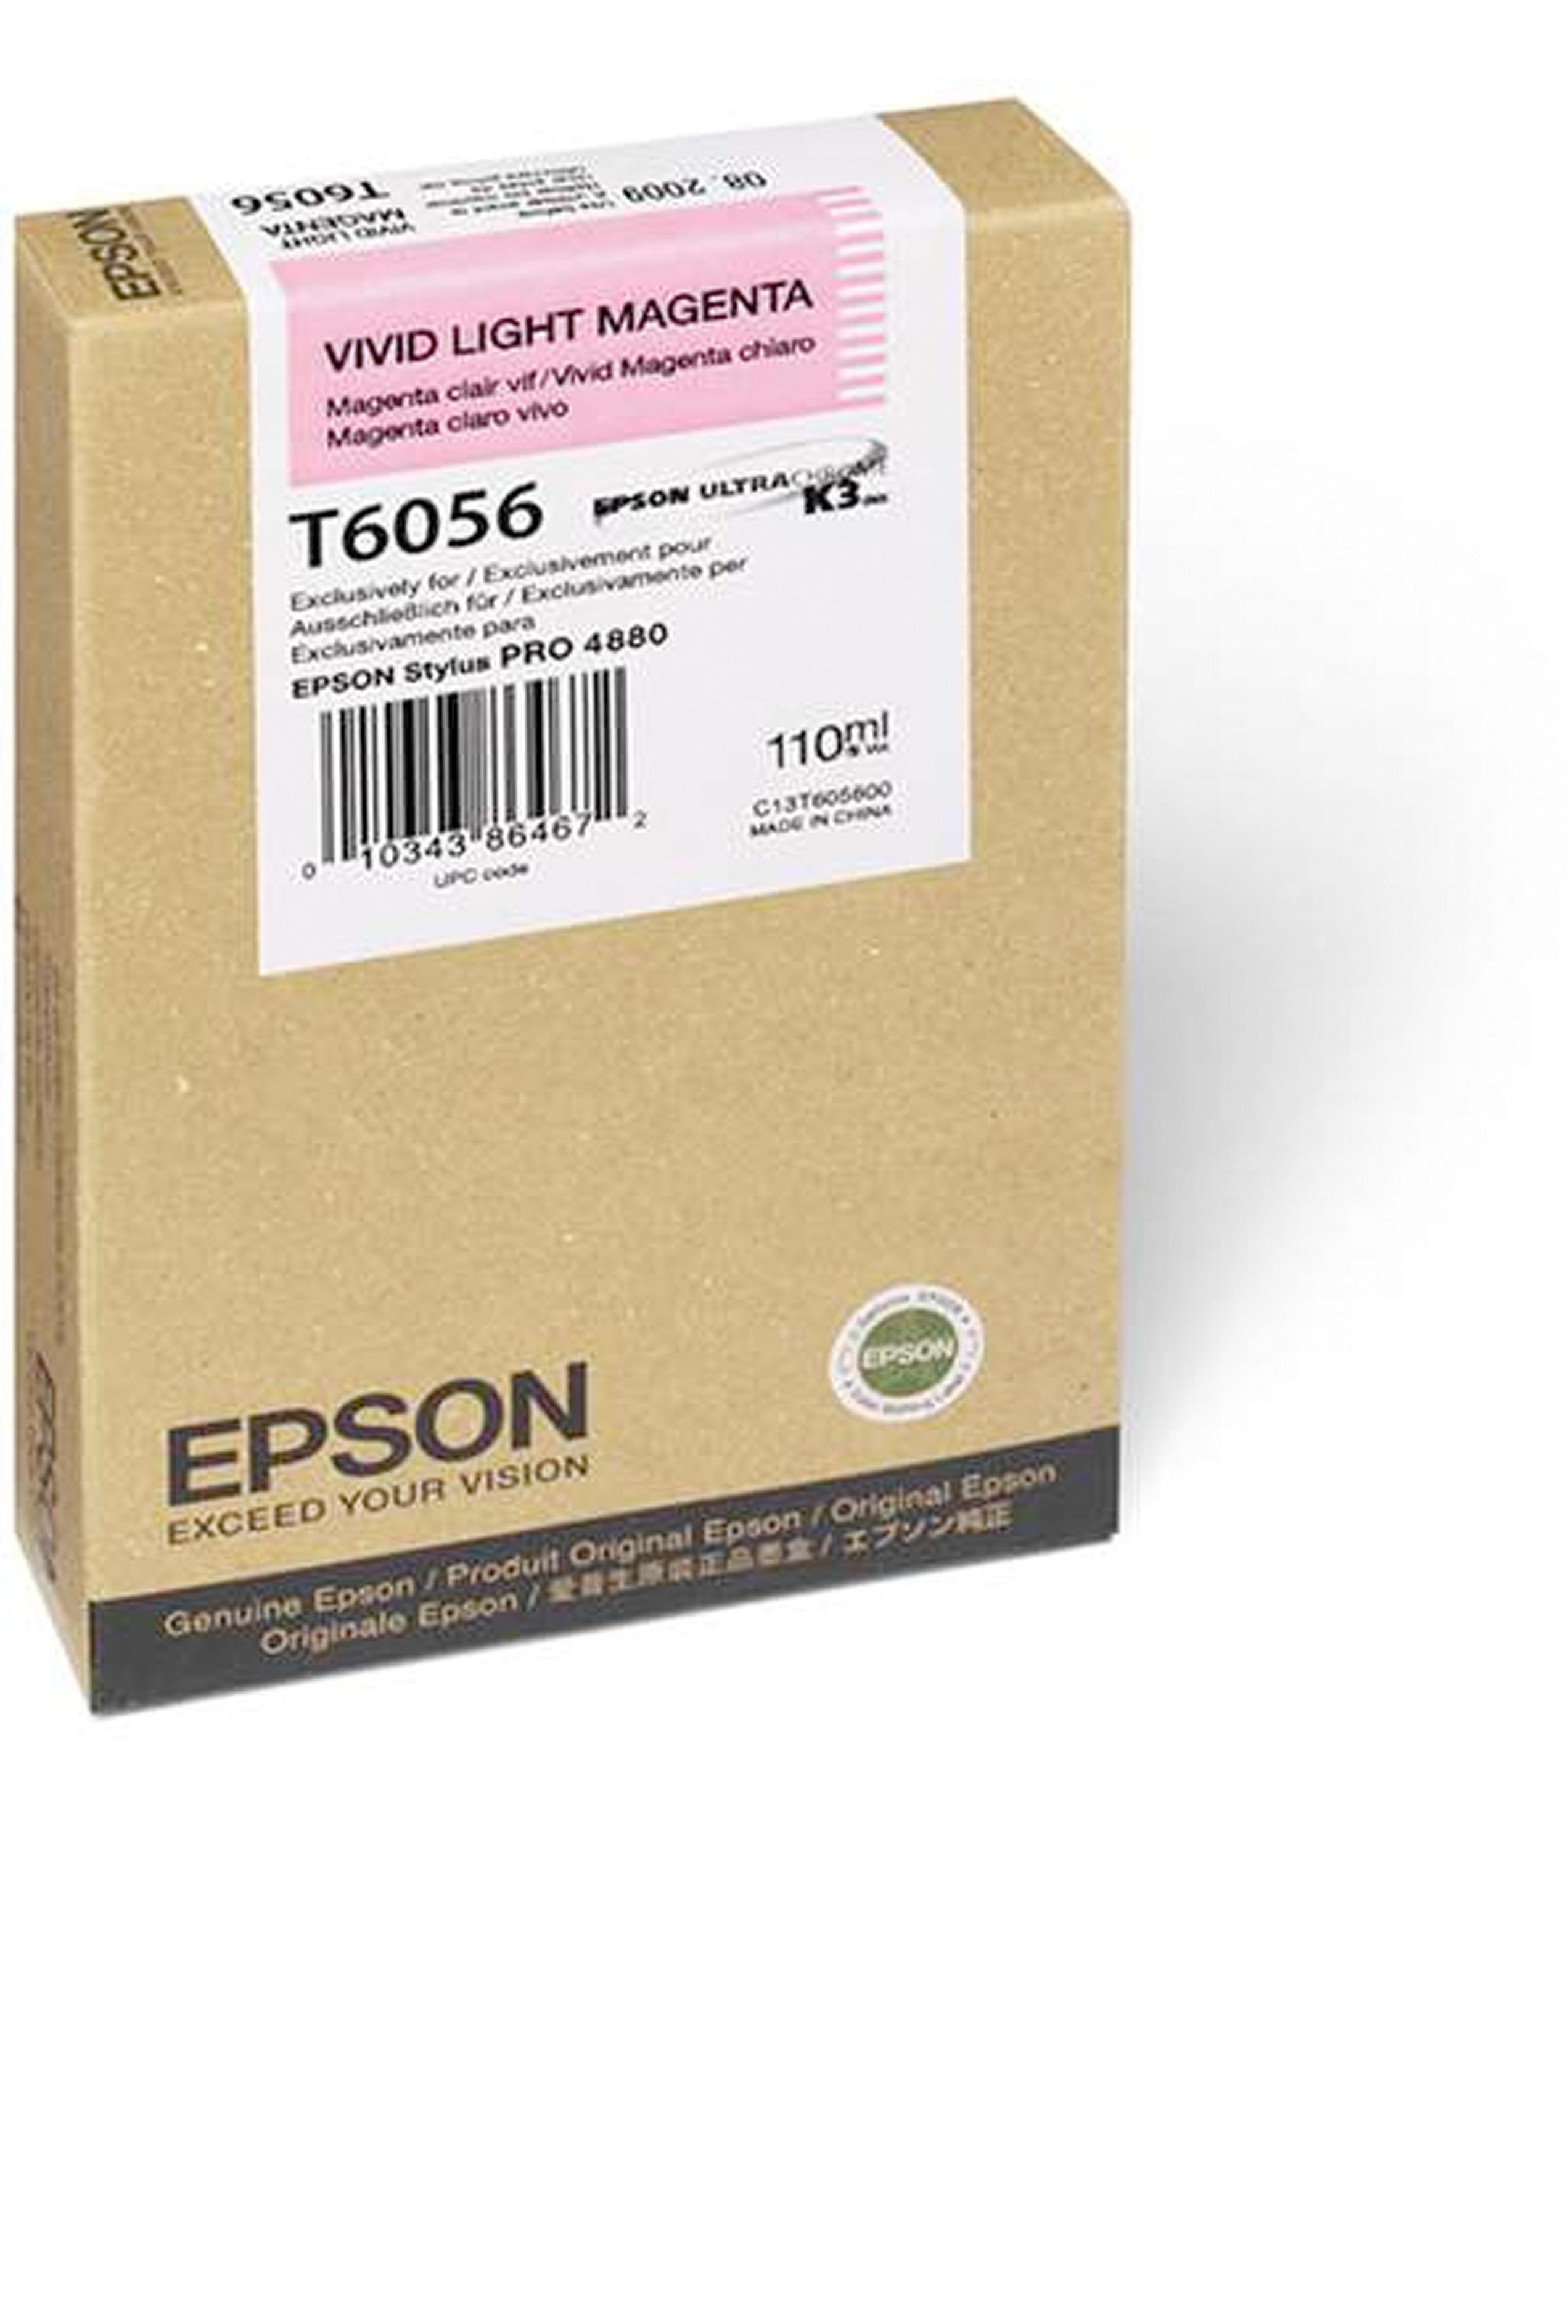 Epson EPSON SD VIVID LT MAGENTA (110 ML) (T605600)